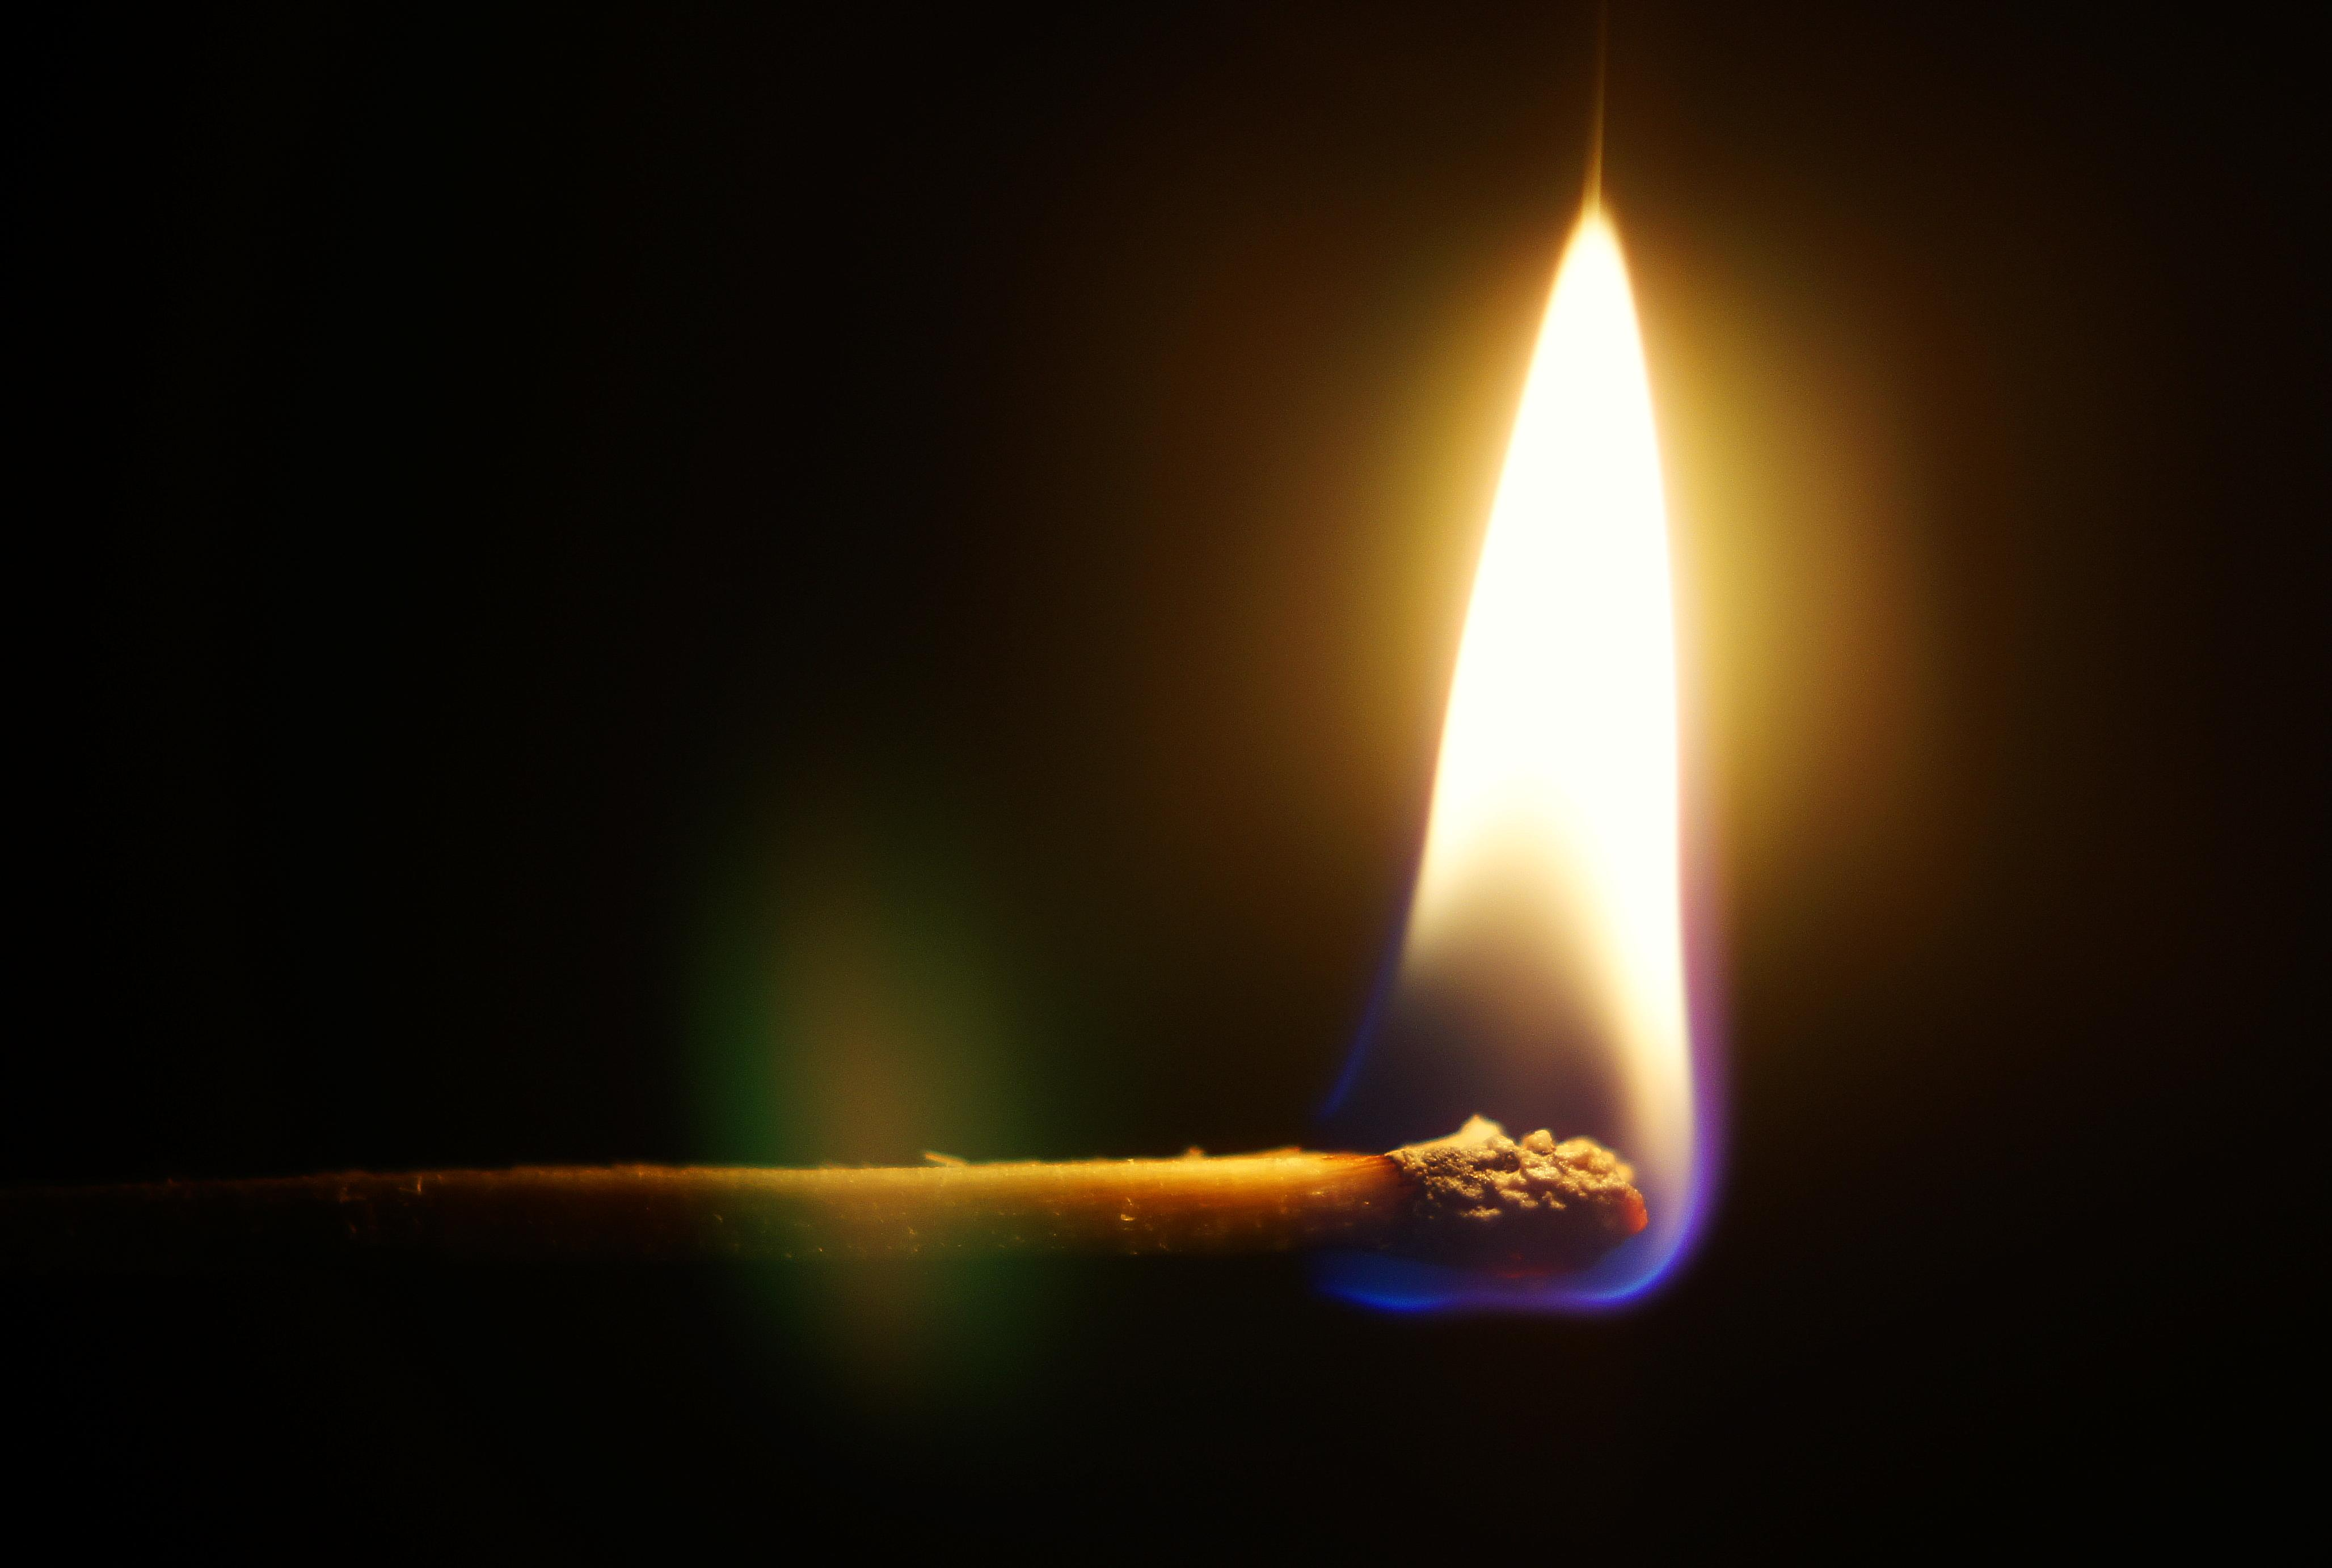 burning match by DoWhoRanZone